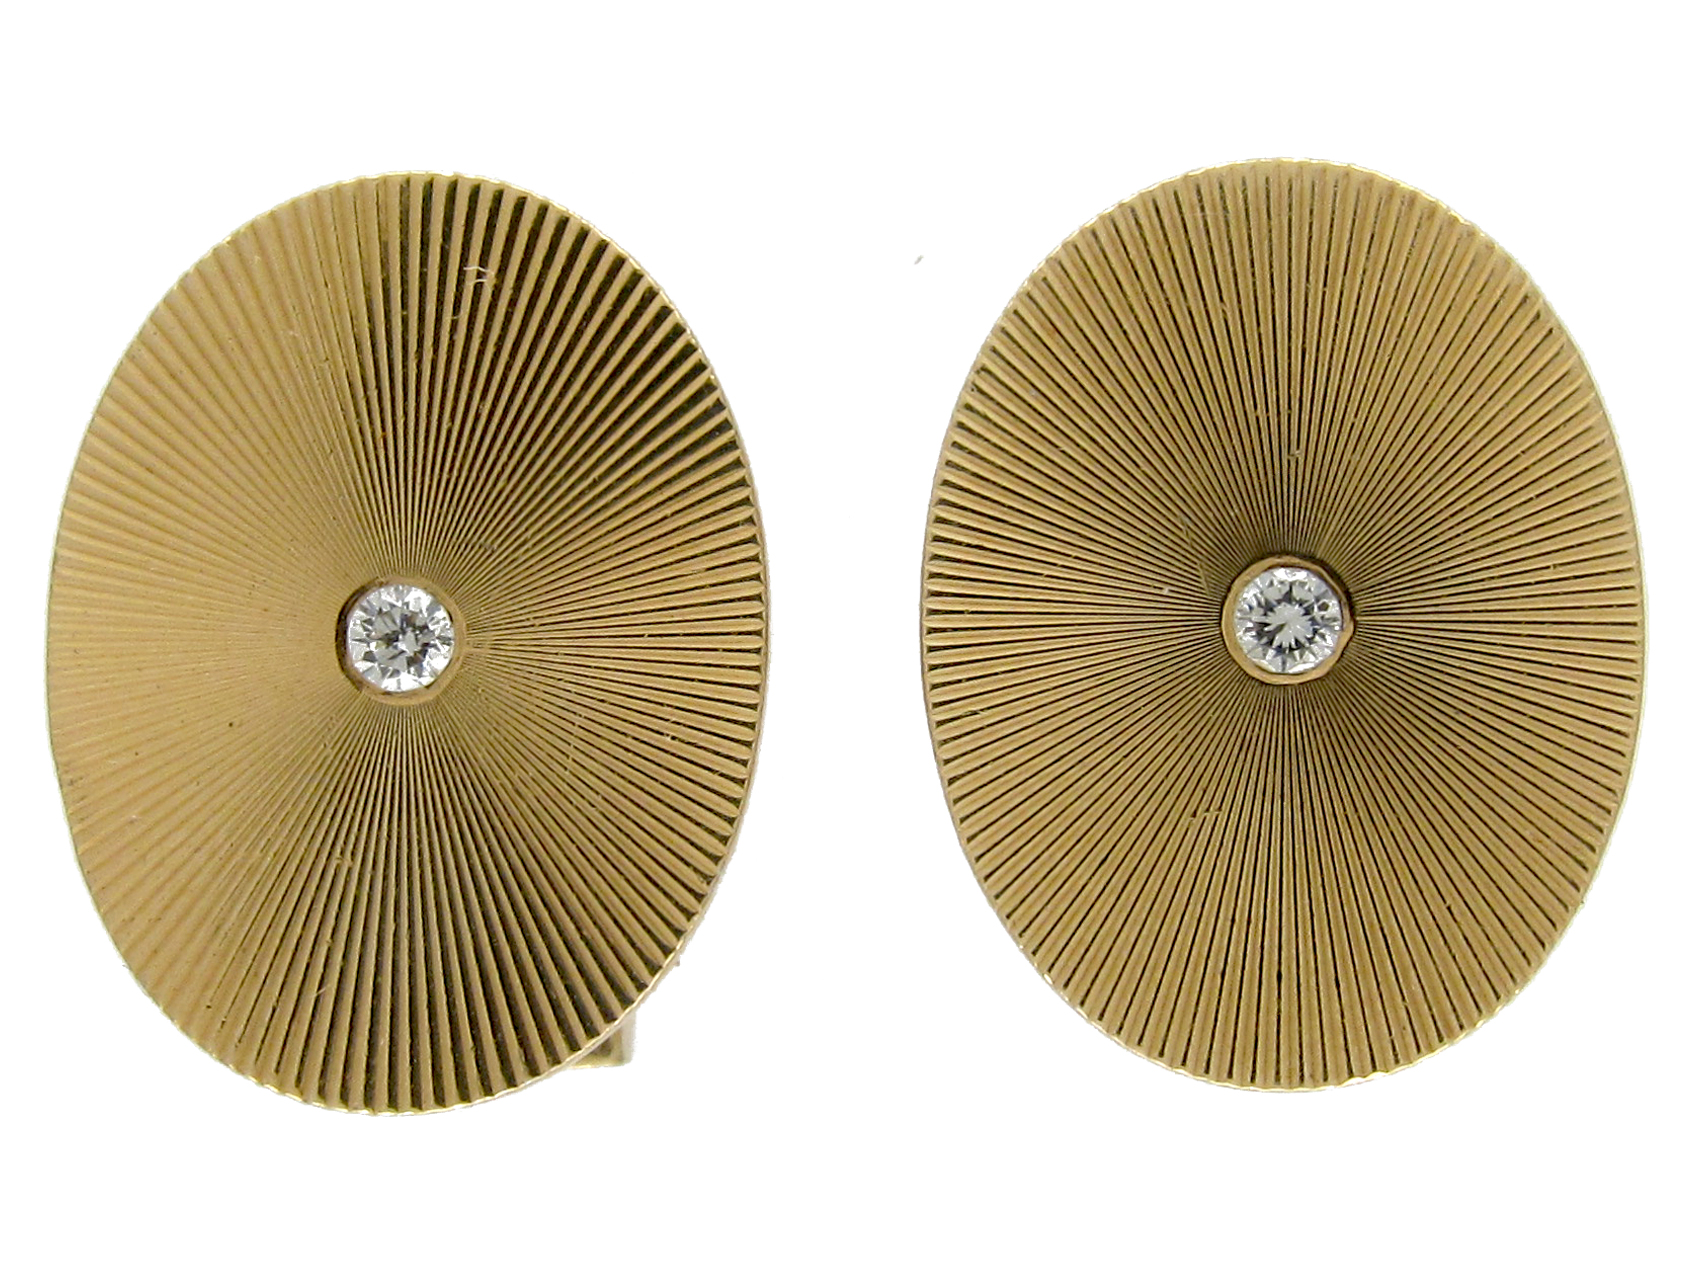 Tiffany & Co. 18ct Gold & Diamond Cufflinks